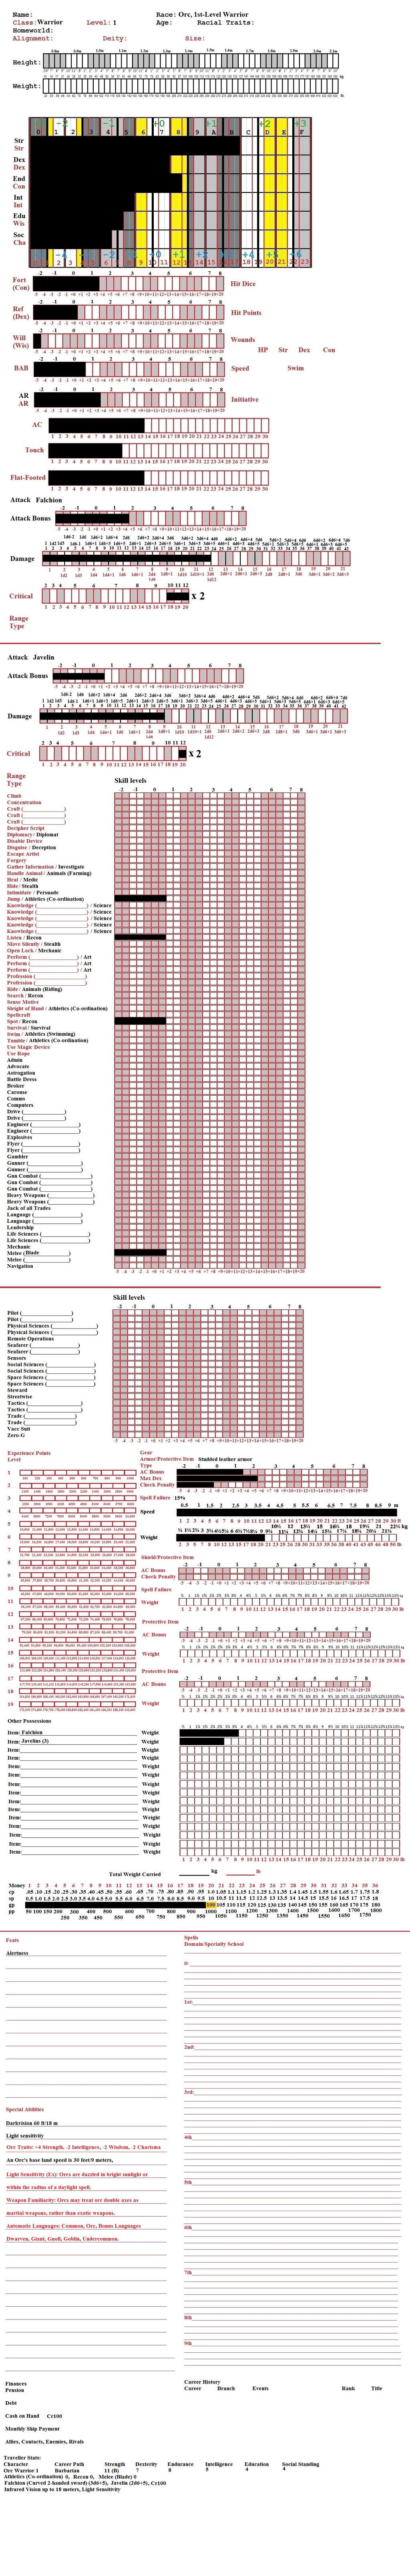 Phase-Proton and Dual Character Sheets - Mongoose Publishing